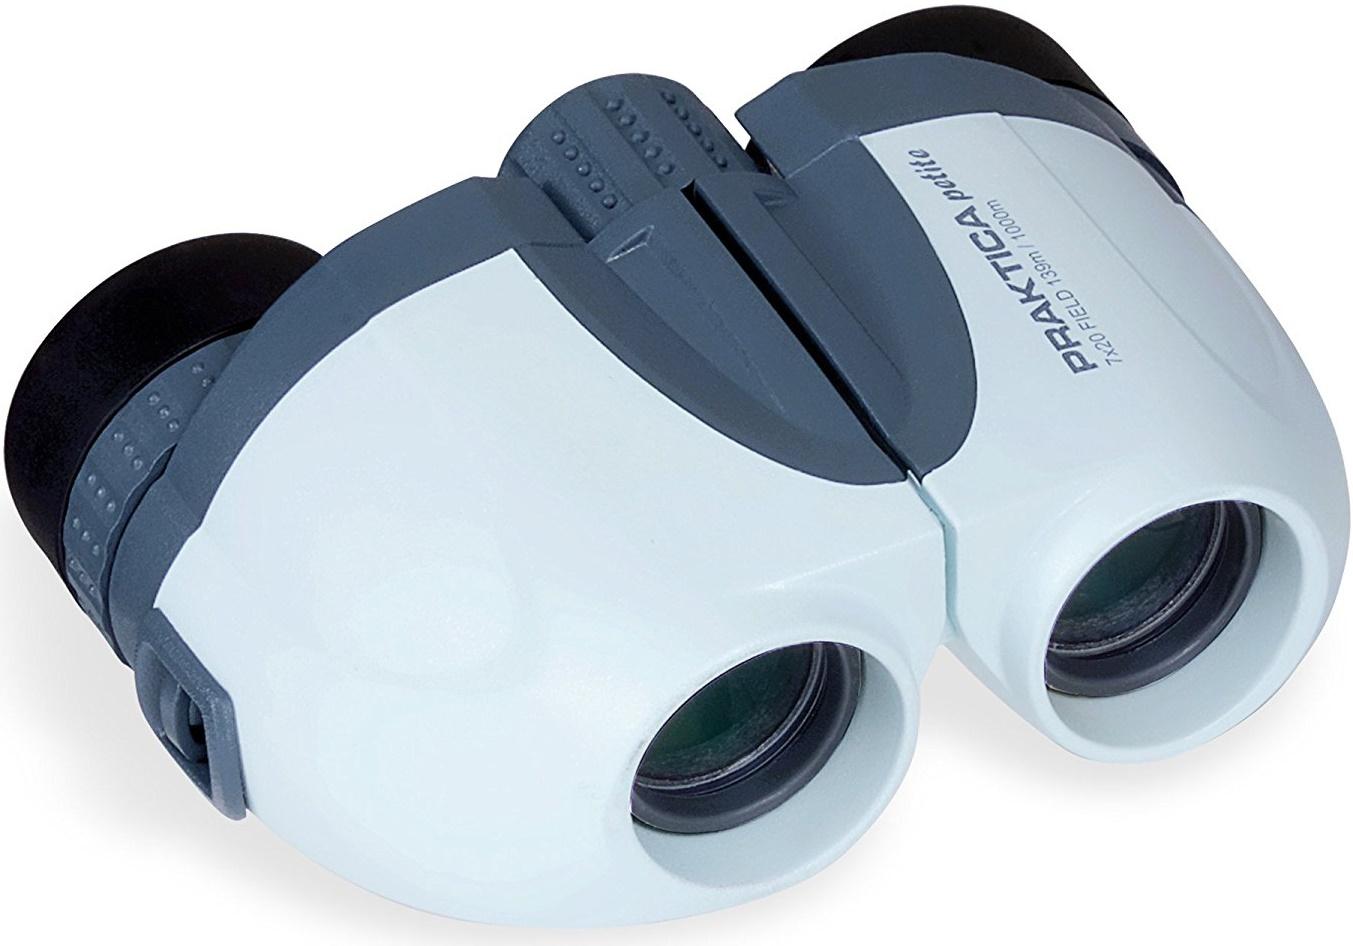 Practika petite 7x20mm binoculars white u390720 w £42.90 london